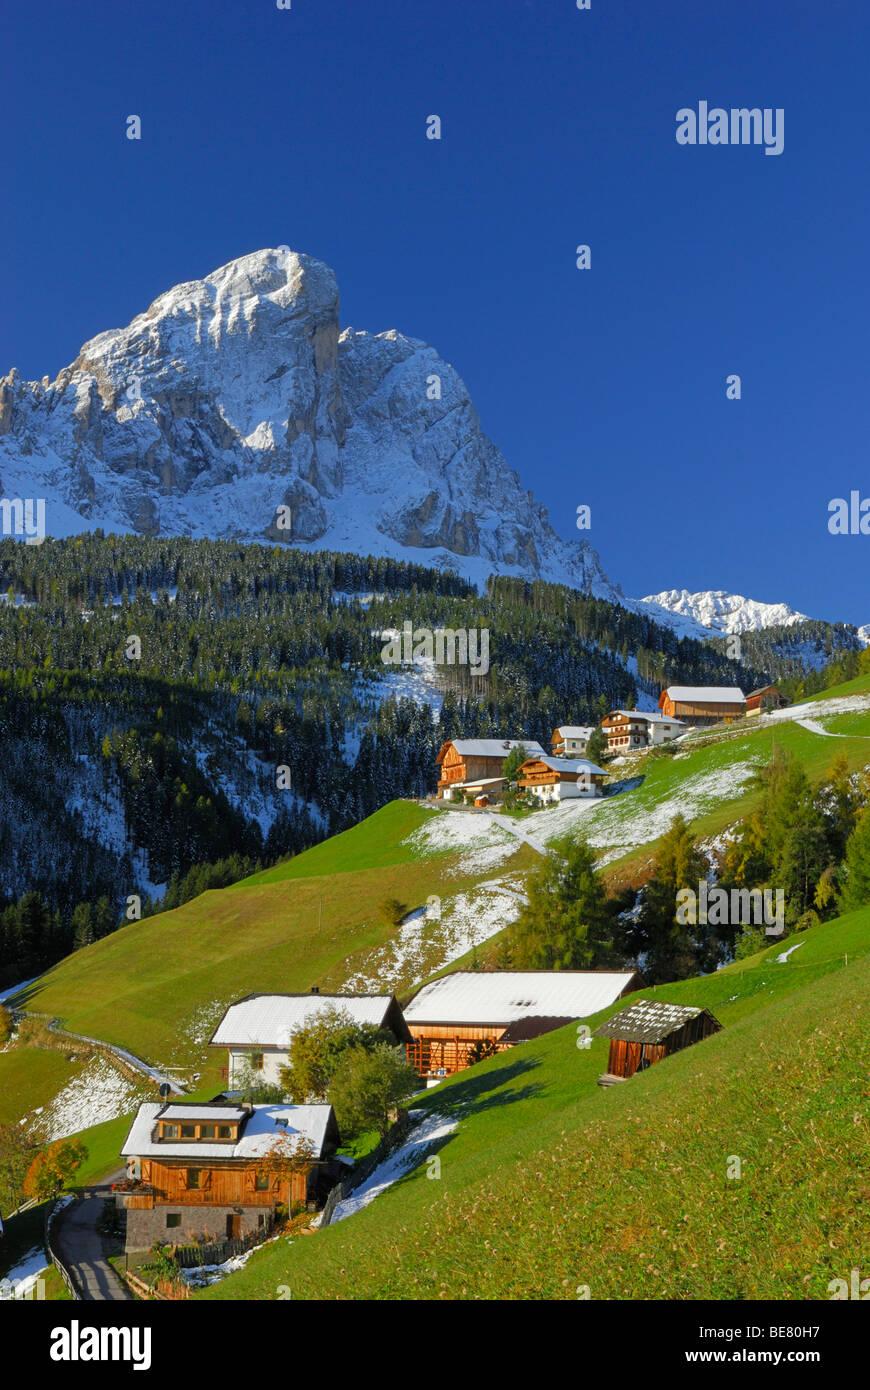 South Tyrolean farmhouses beneath Peitlerkofel, valley Gadertal, Dolomites, South Tyrol, Italy - Stock Image